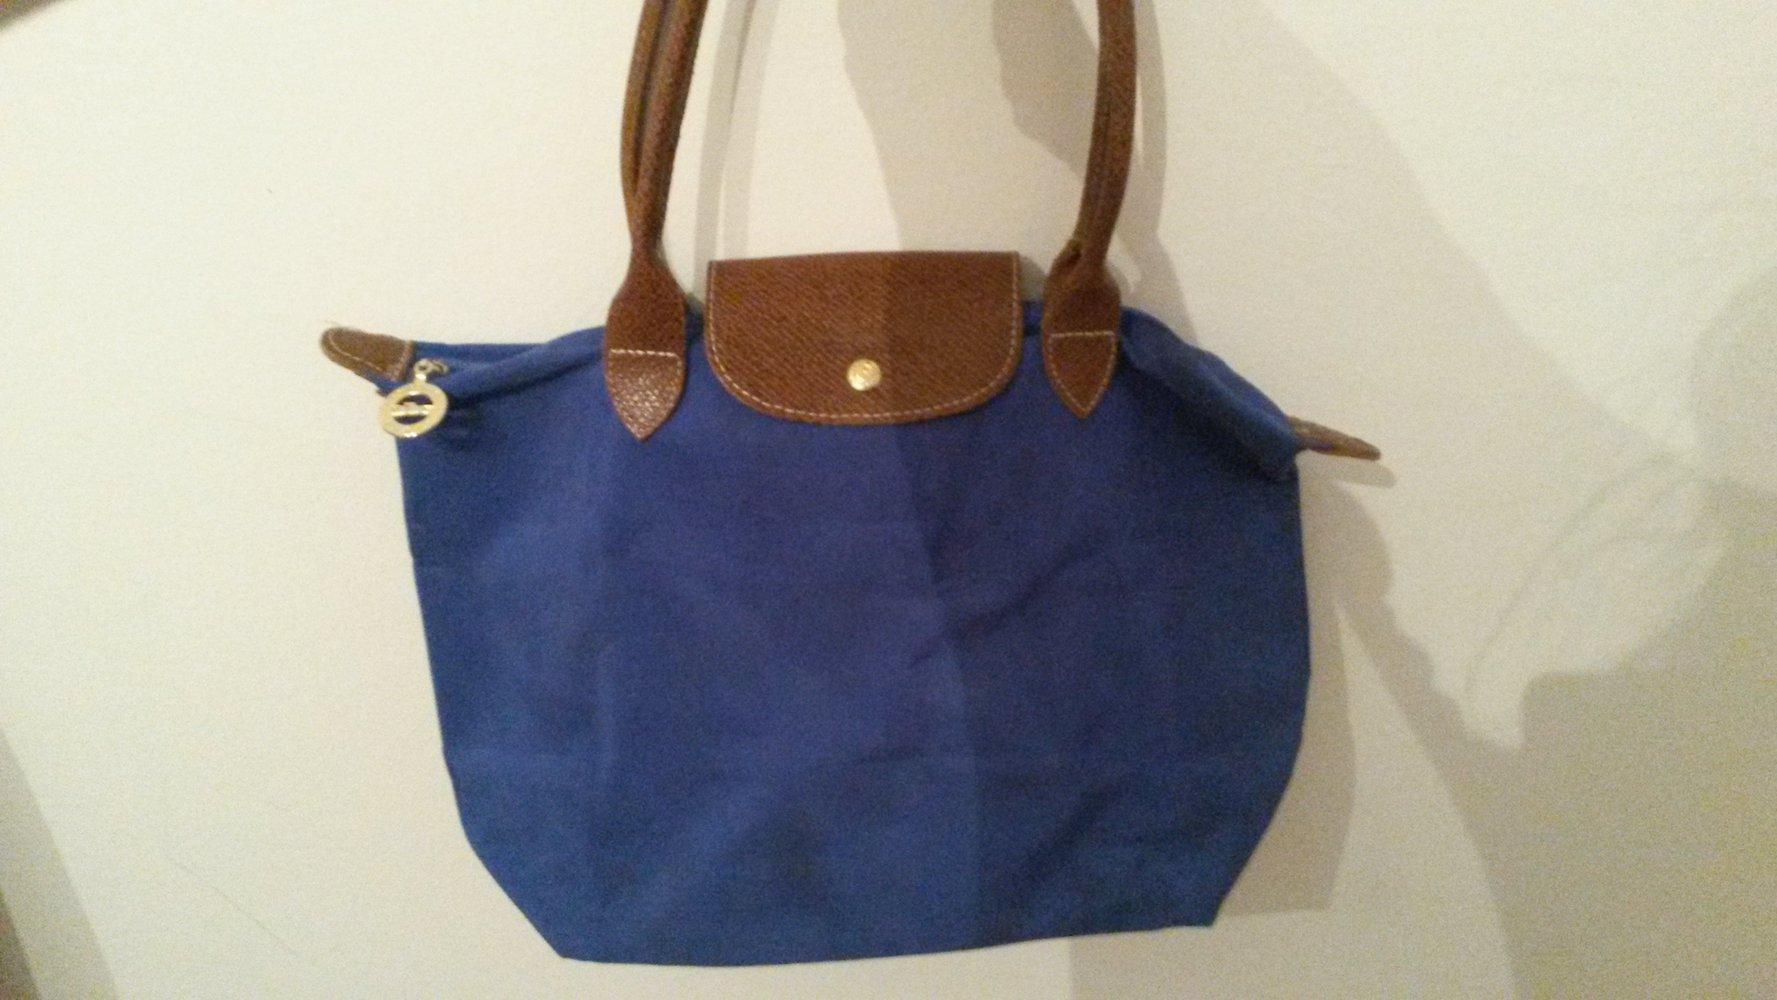 84c3a9760a1c3 Schicke blaue Tasche    Kleiderkorb.de